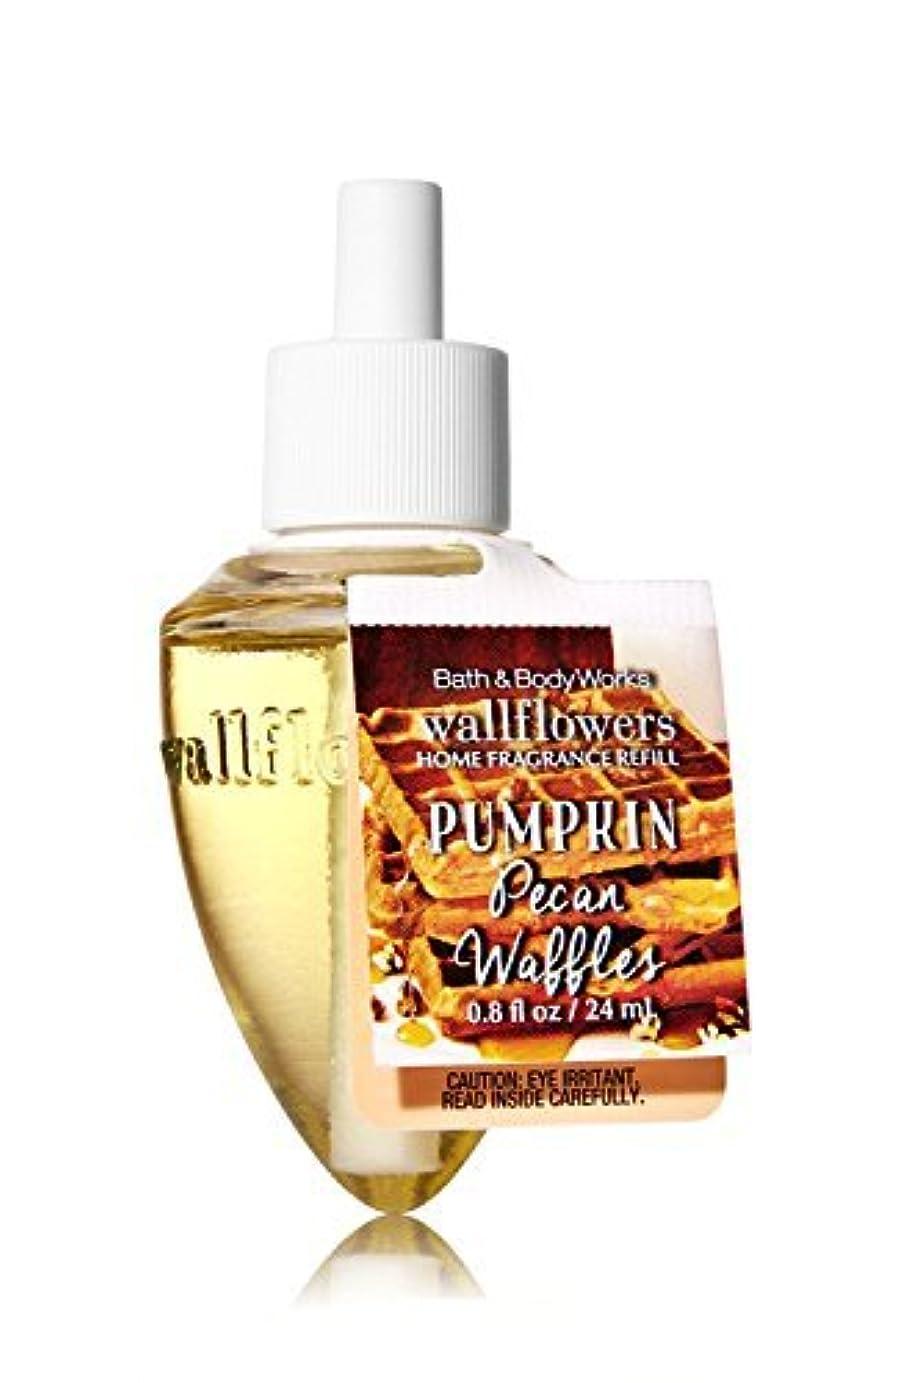 【Bath&Body Works/バス&ボディワークス】 ルームフレグランス 詰替えリフィル パンプキンピーカンワッフル Wallflowers Home Fragrance Refill Pumpkin Pecan Waffles [並行輸入品]